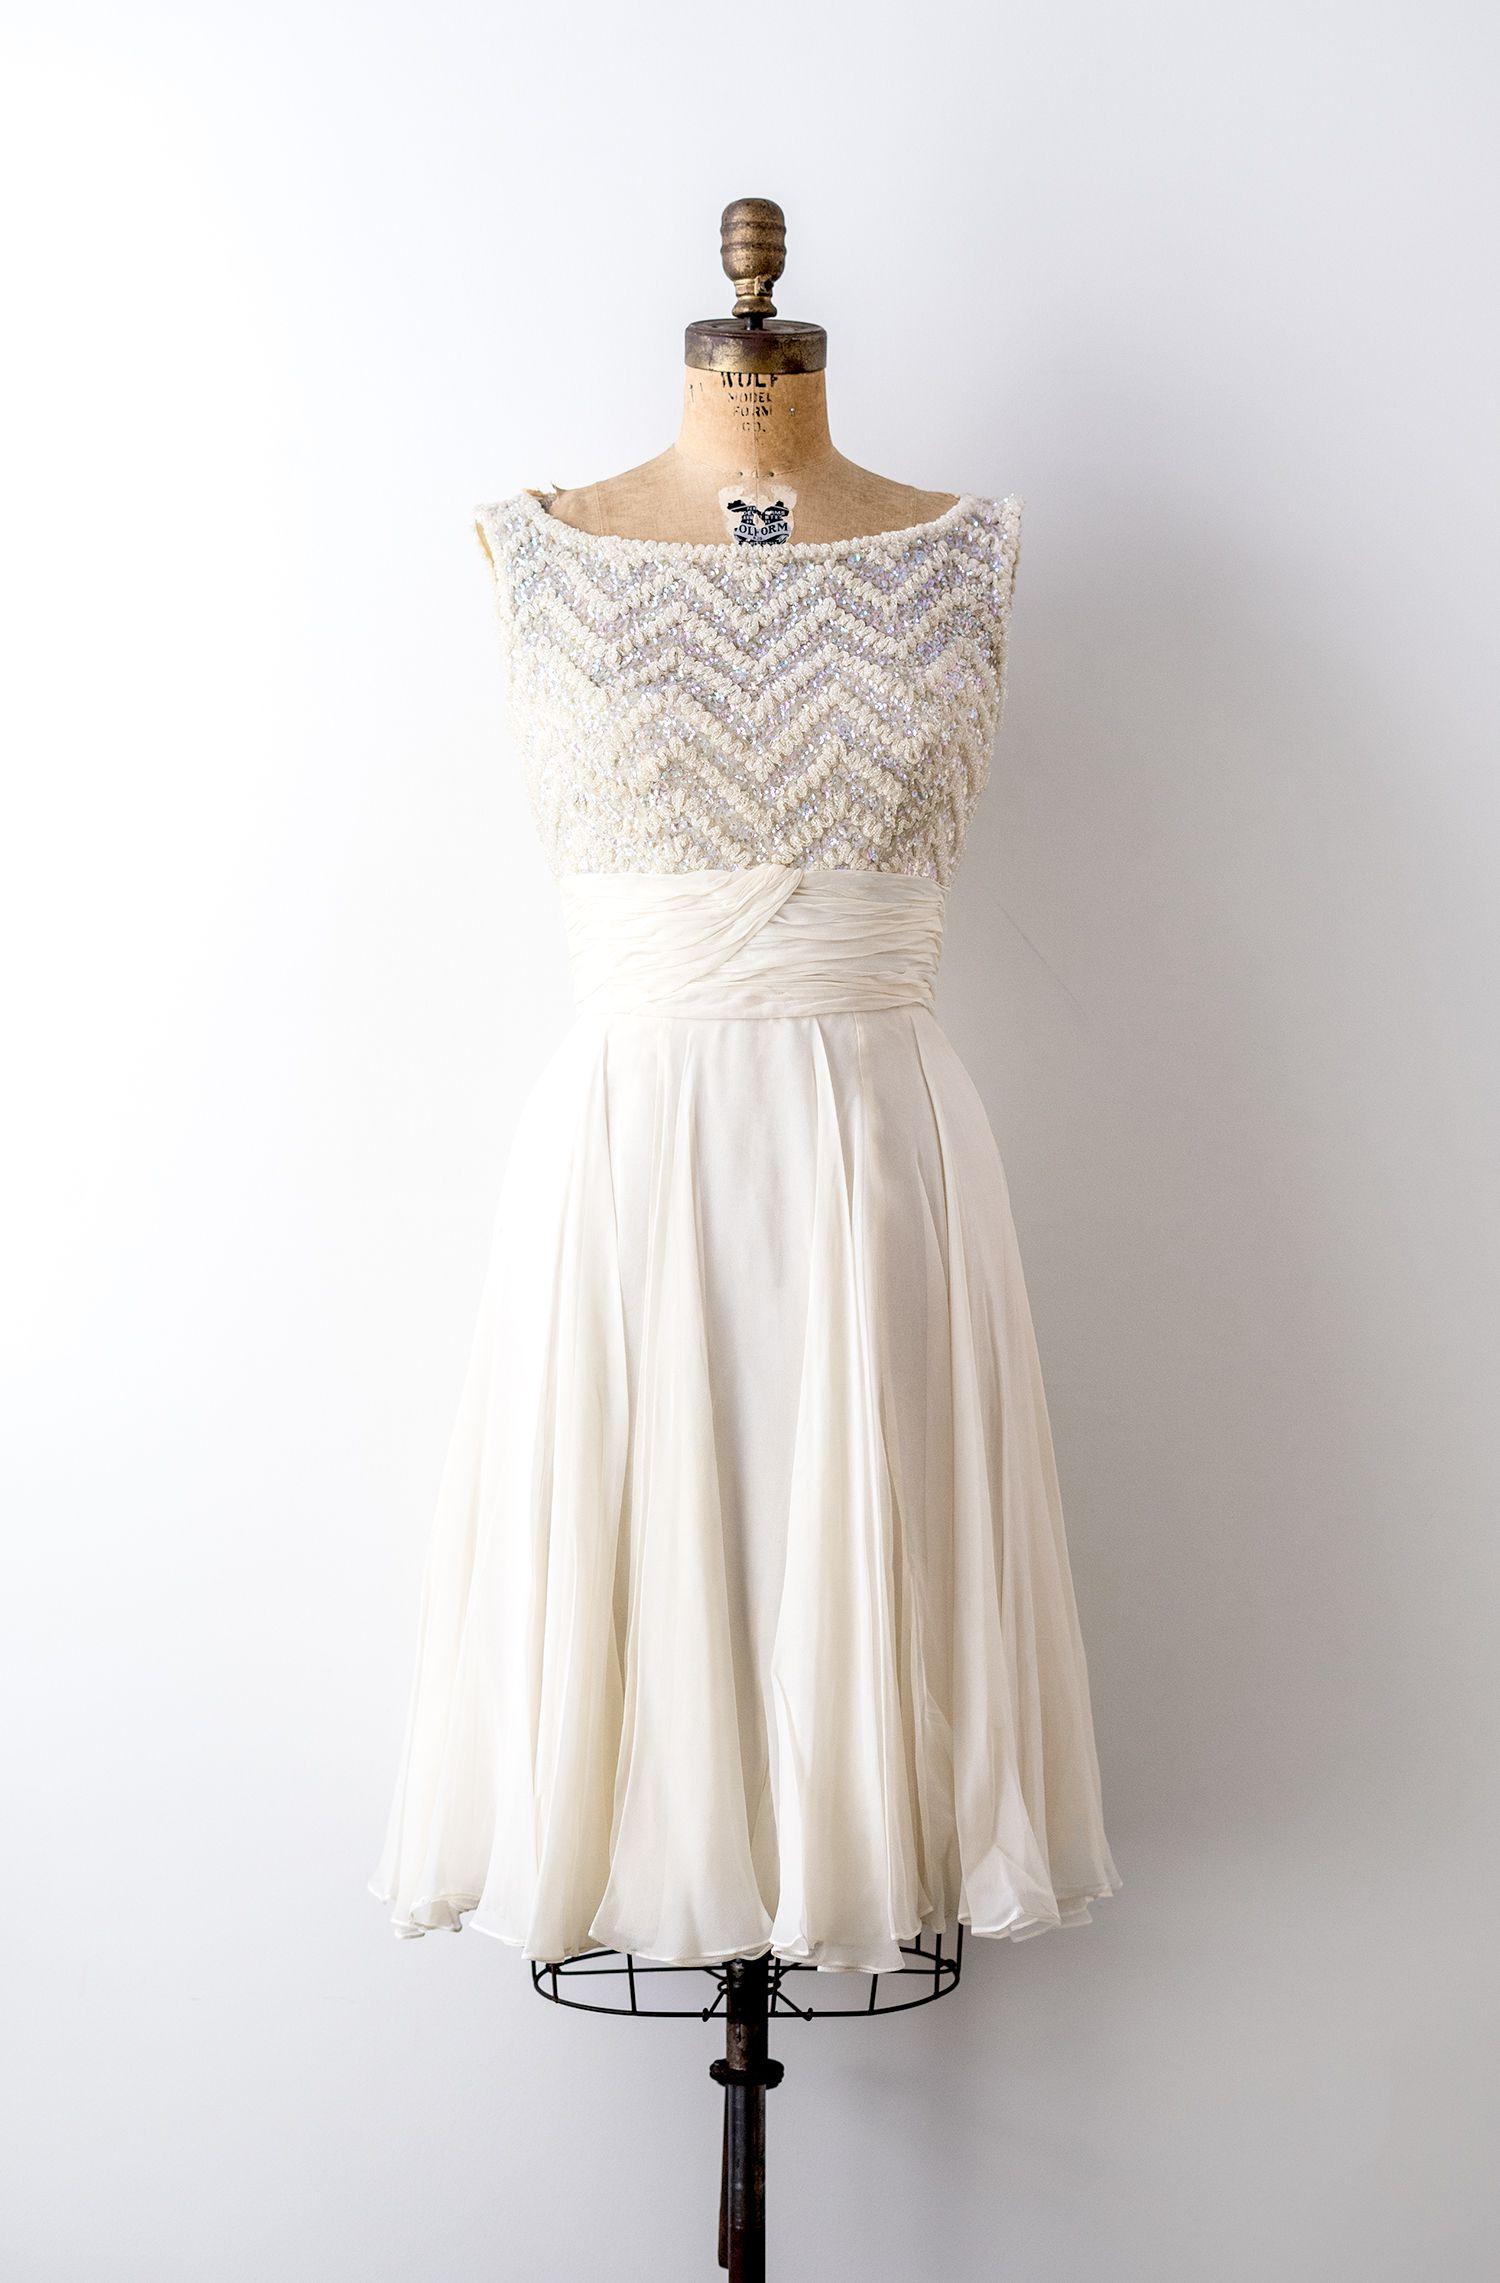 1950 Ivory Dress Vintage 50s Party Dress White Chiffon Etsy Dresses 1950s Party Dresses 1950s Fashion [ 2283 x 1500 Pixel ]